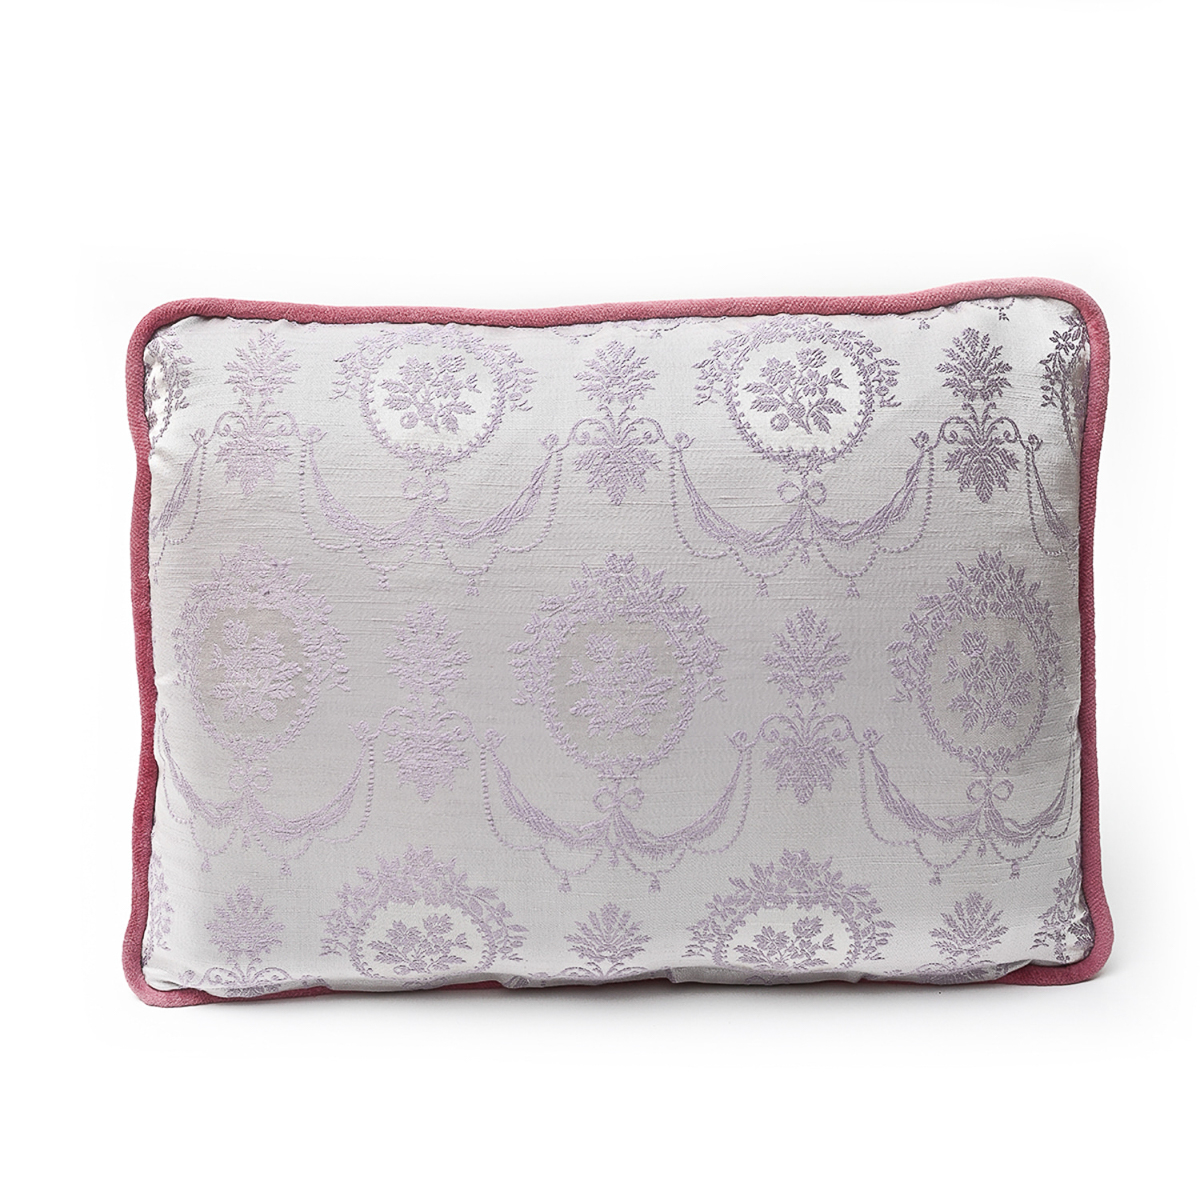 Pair Of Pillows, Floral on Lemon: 14 x 18